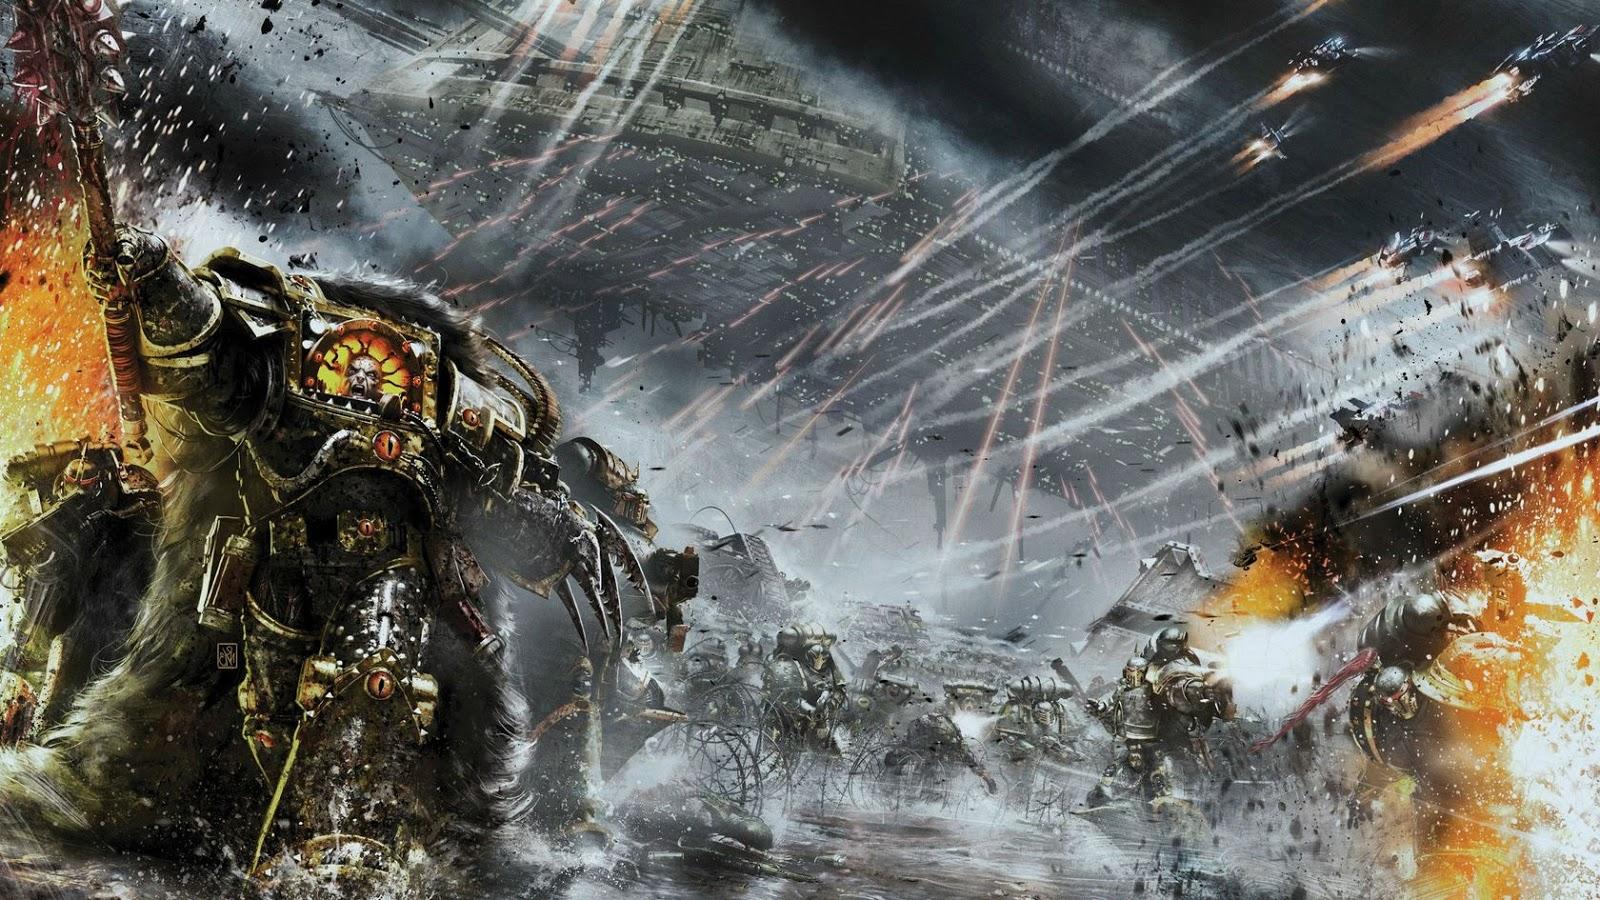 wallpaper warhammer 40k video - photo #20